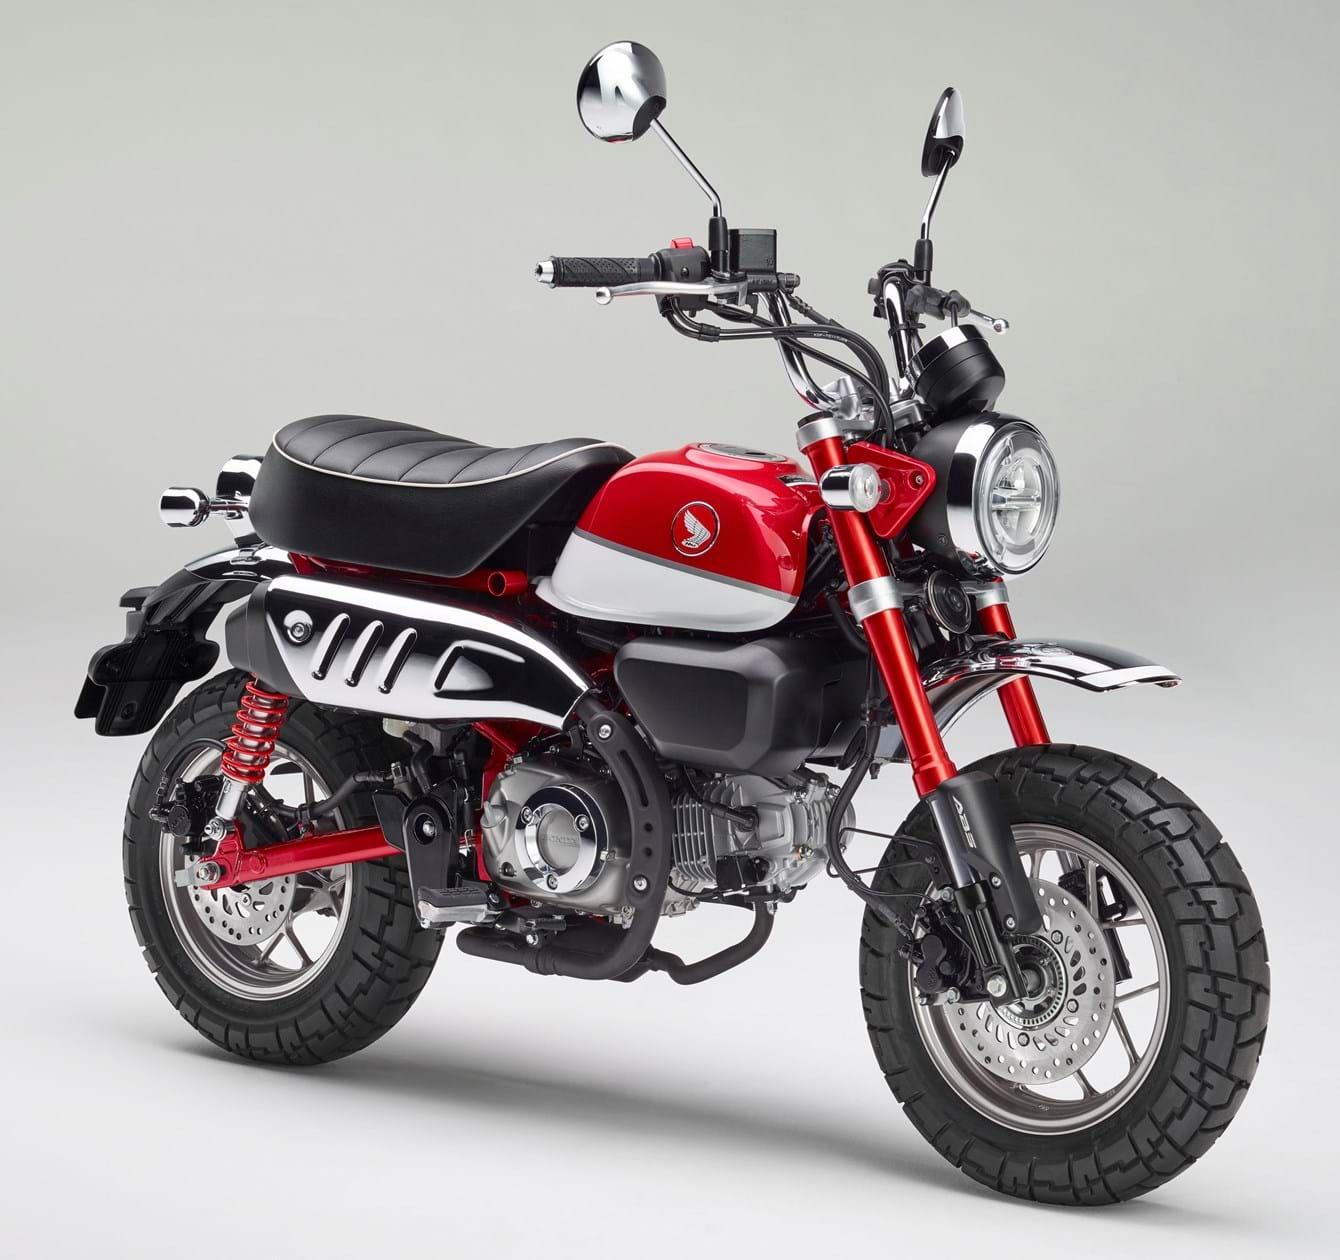 For Sale Honda Monkey The Bike Market